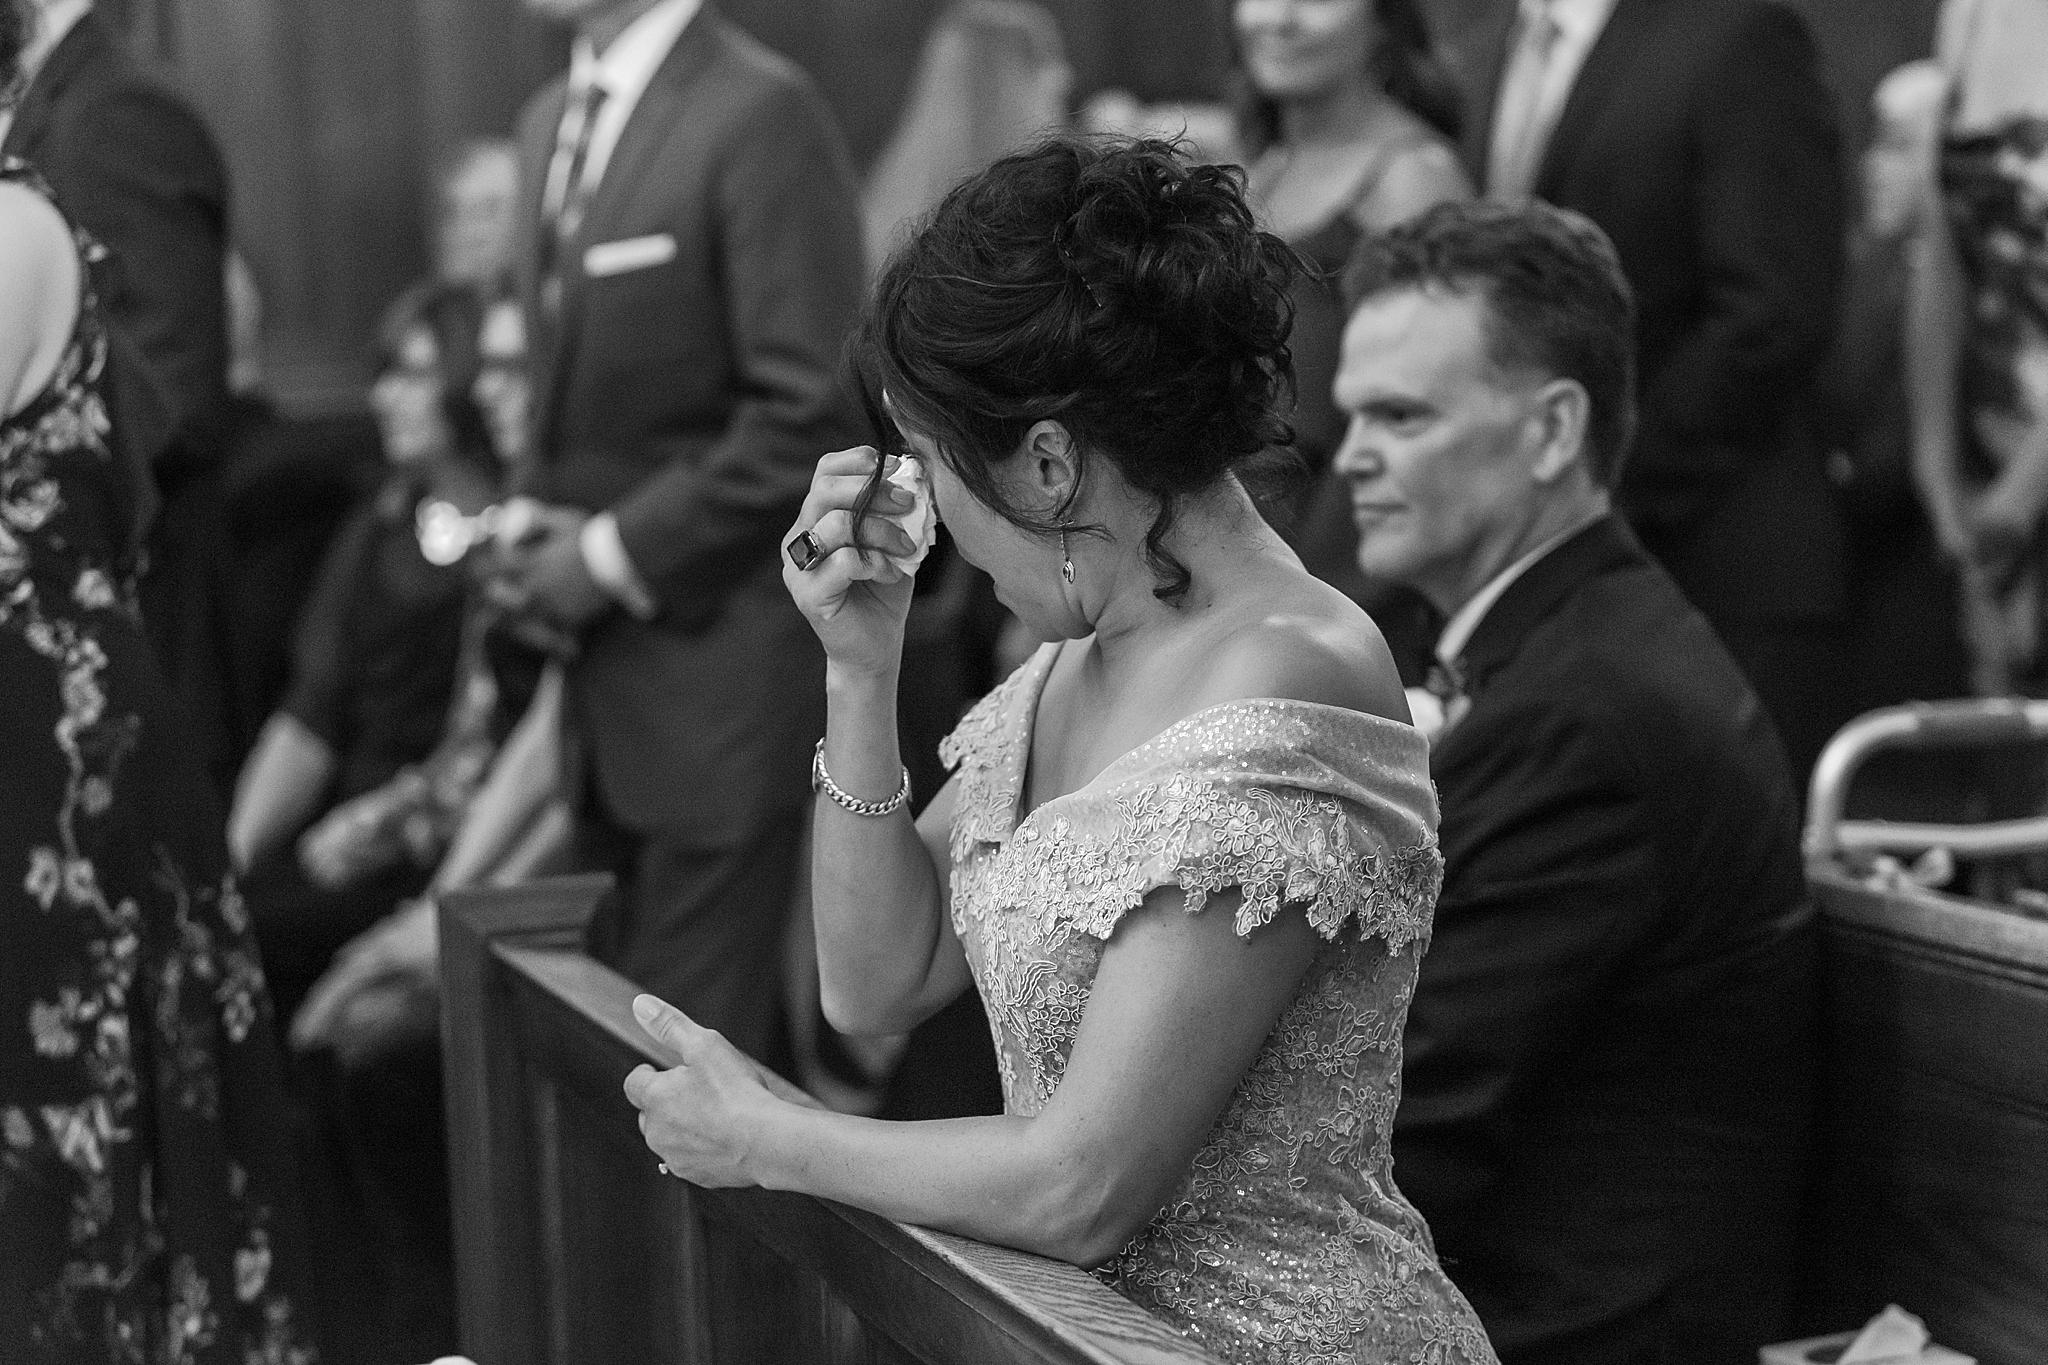 detroit-wedding-photographer-grosse-pointe-academy-chapel-detroit-golf-club-wedding-carly-matt-by-courtney-carolyn-photography_0050.jpg